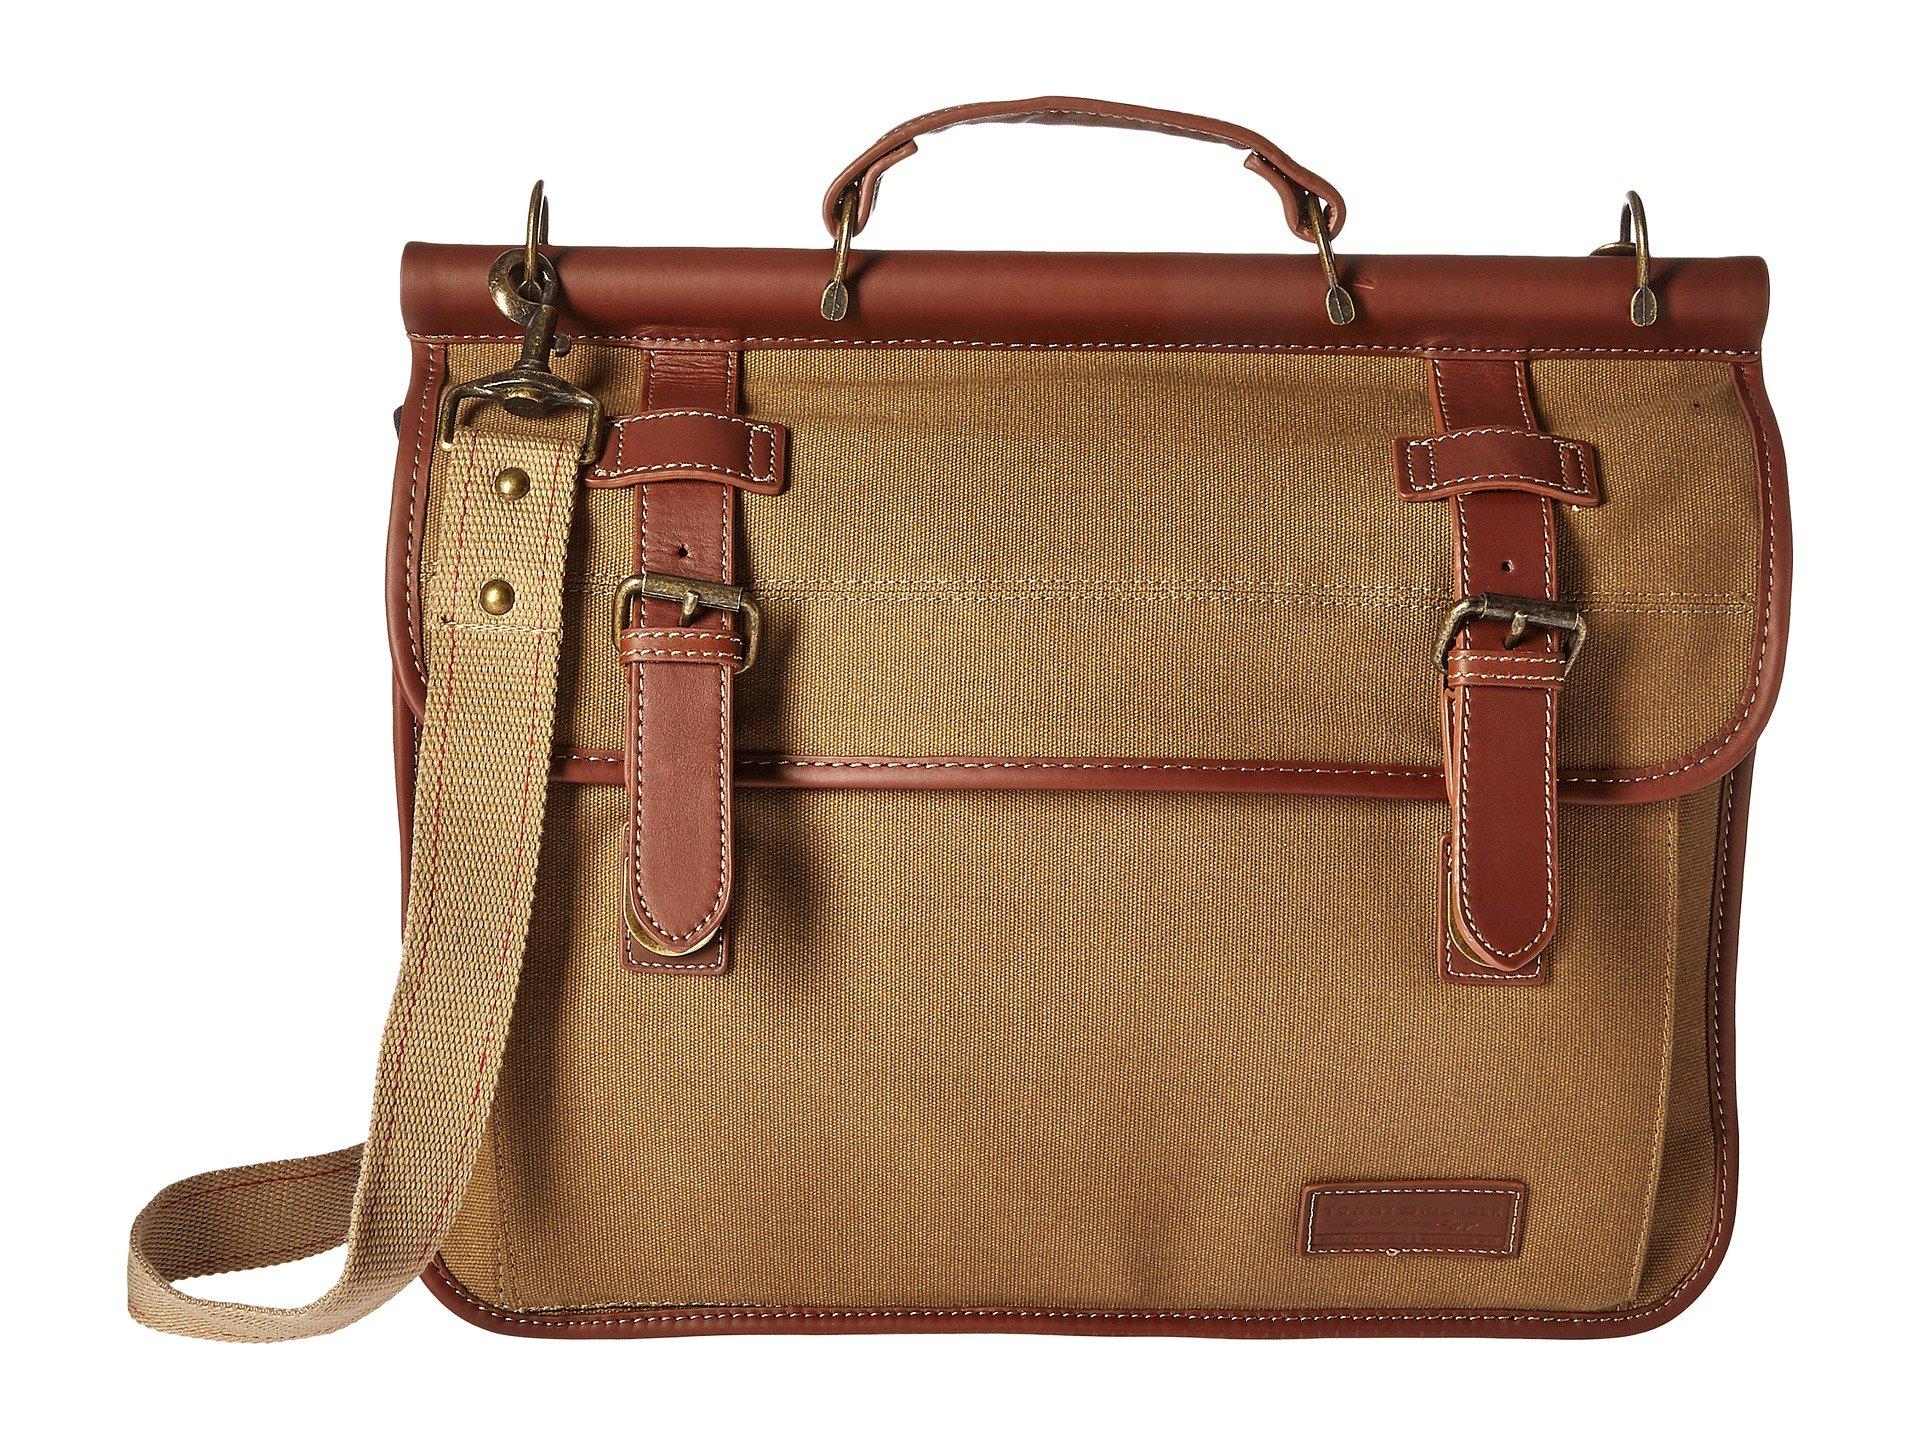 Bolso Cruzado para Hombre Tommy Hilfiger Workhorse Bag  + Tommy Hilfiger en VeoyCompro.net